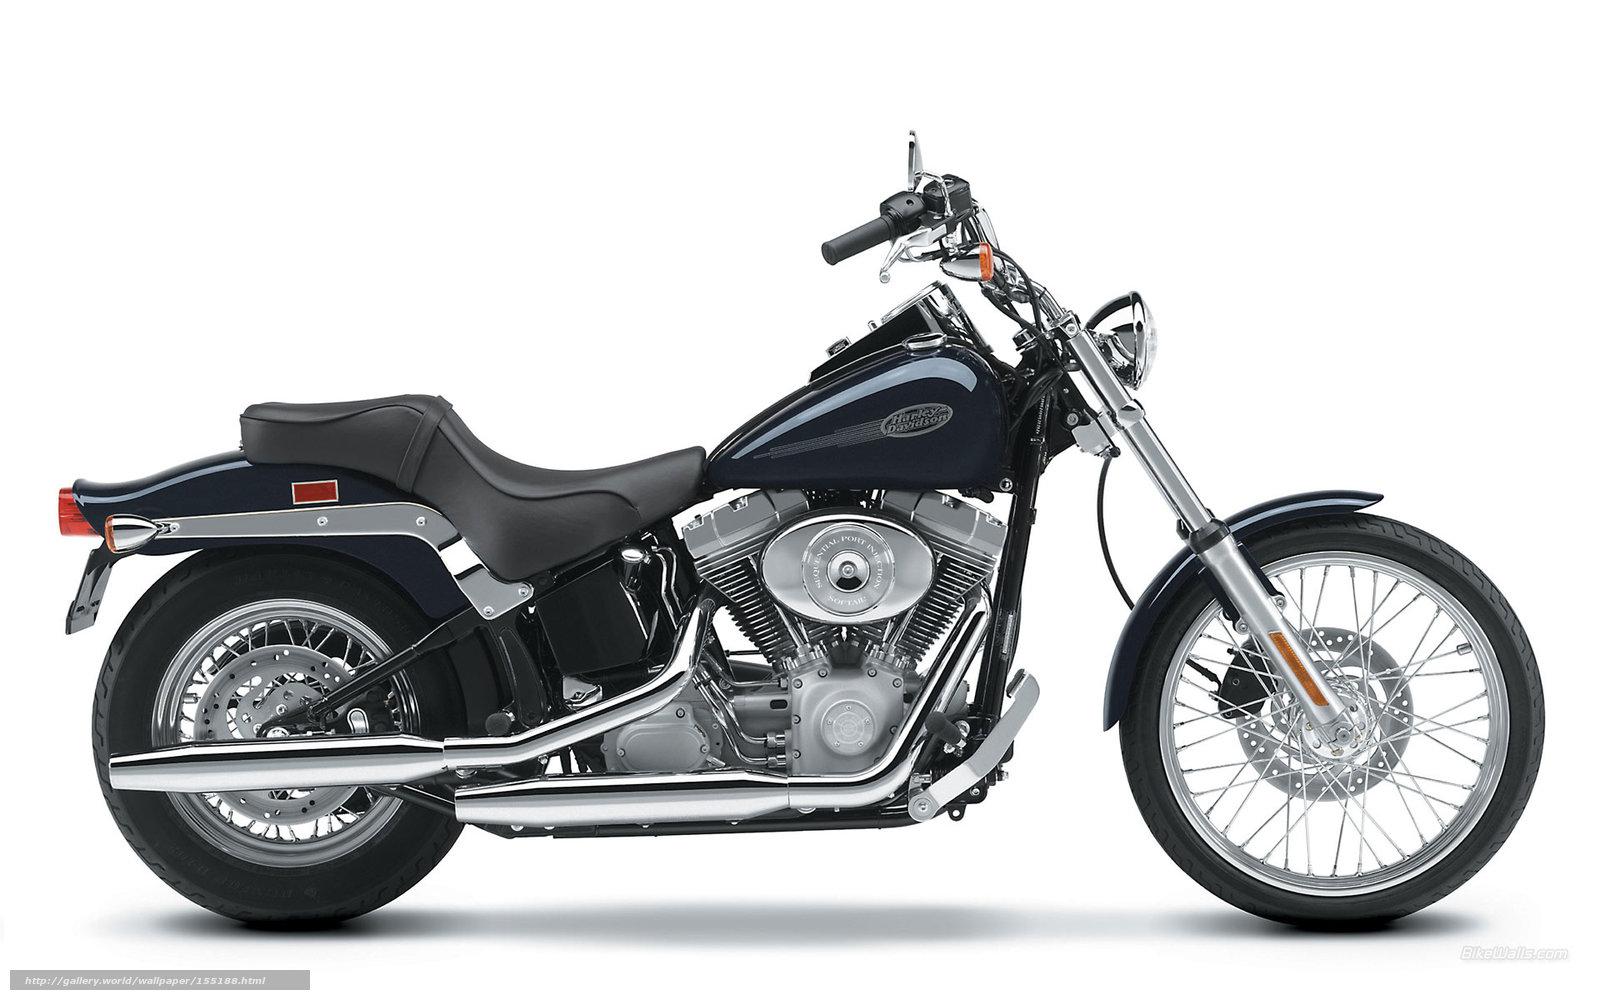 Harley-davidson fxst softail standard 1988 pics #163025